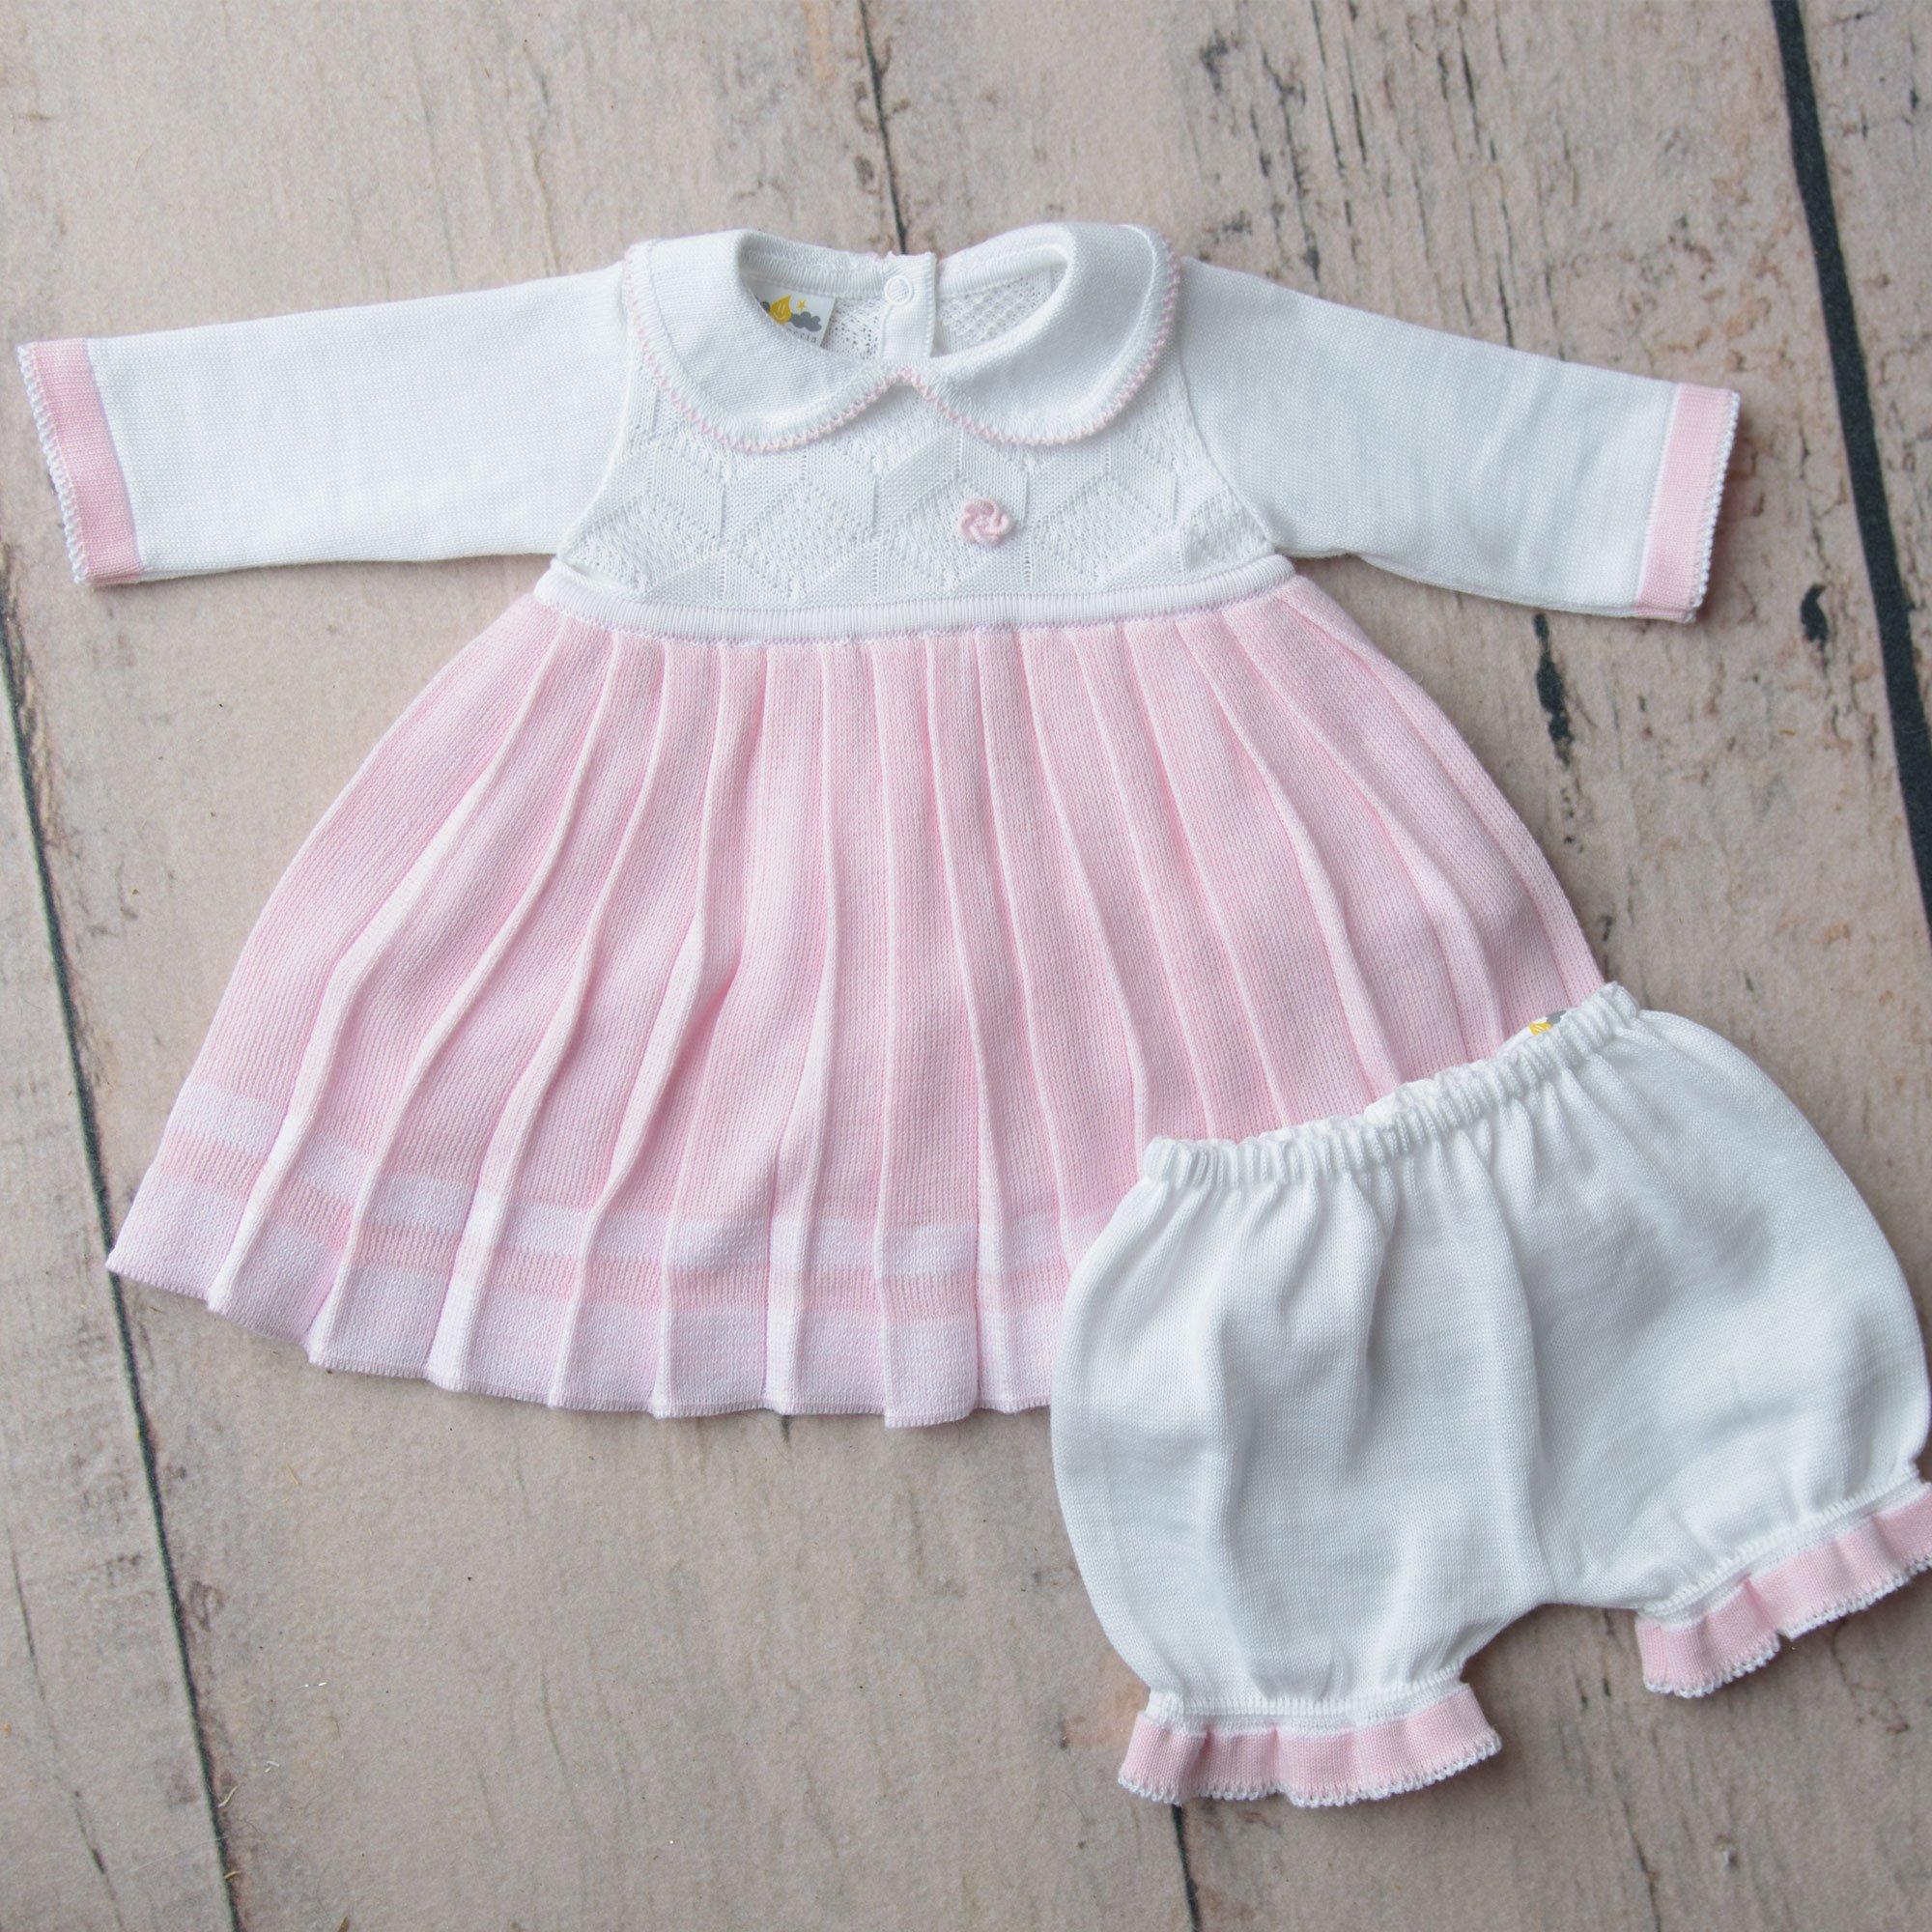 83fcc30ea228 Dolce Goccia Charlotte 2 Pc. Dress and Bloomer Set